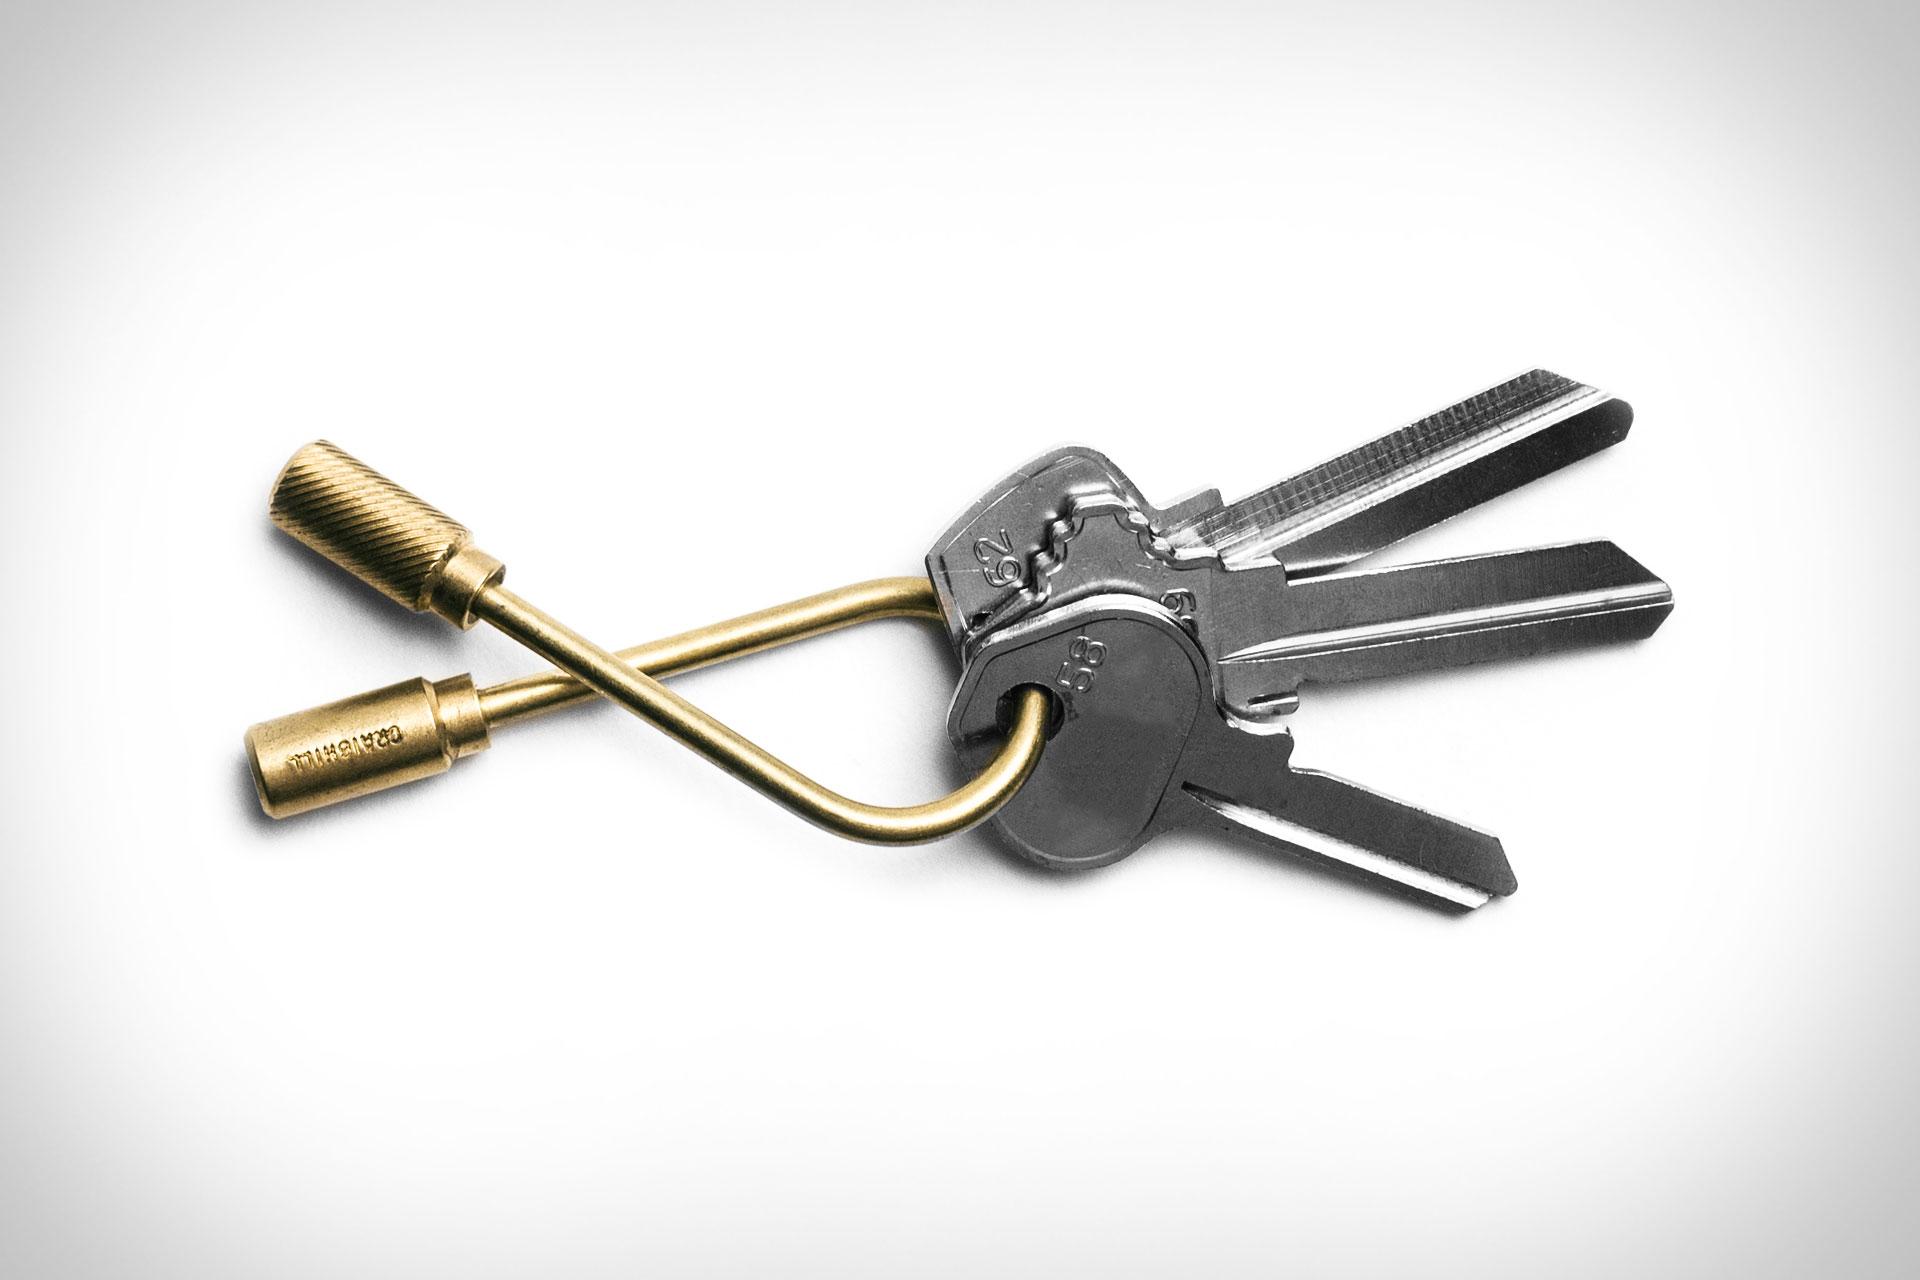 Craighill Helix keychain